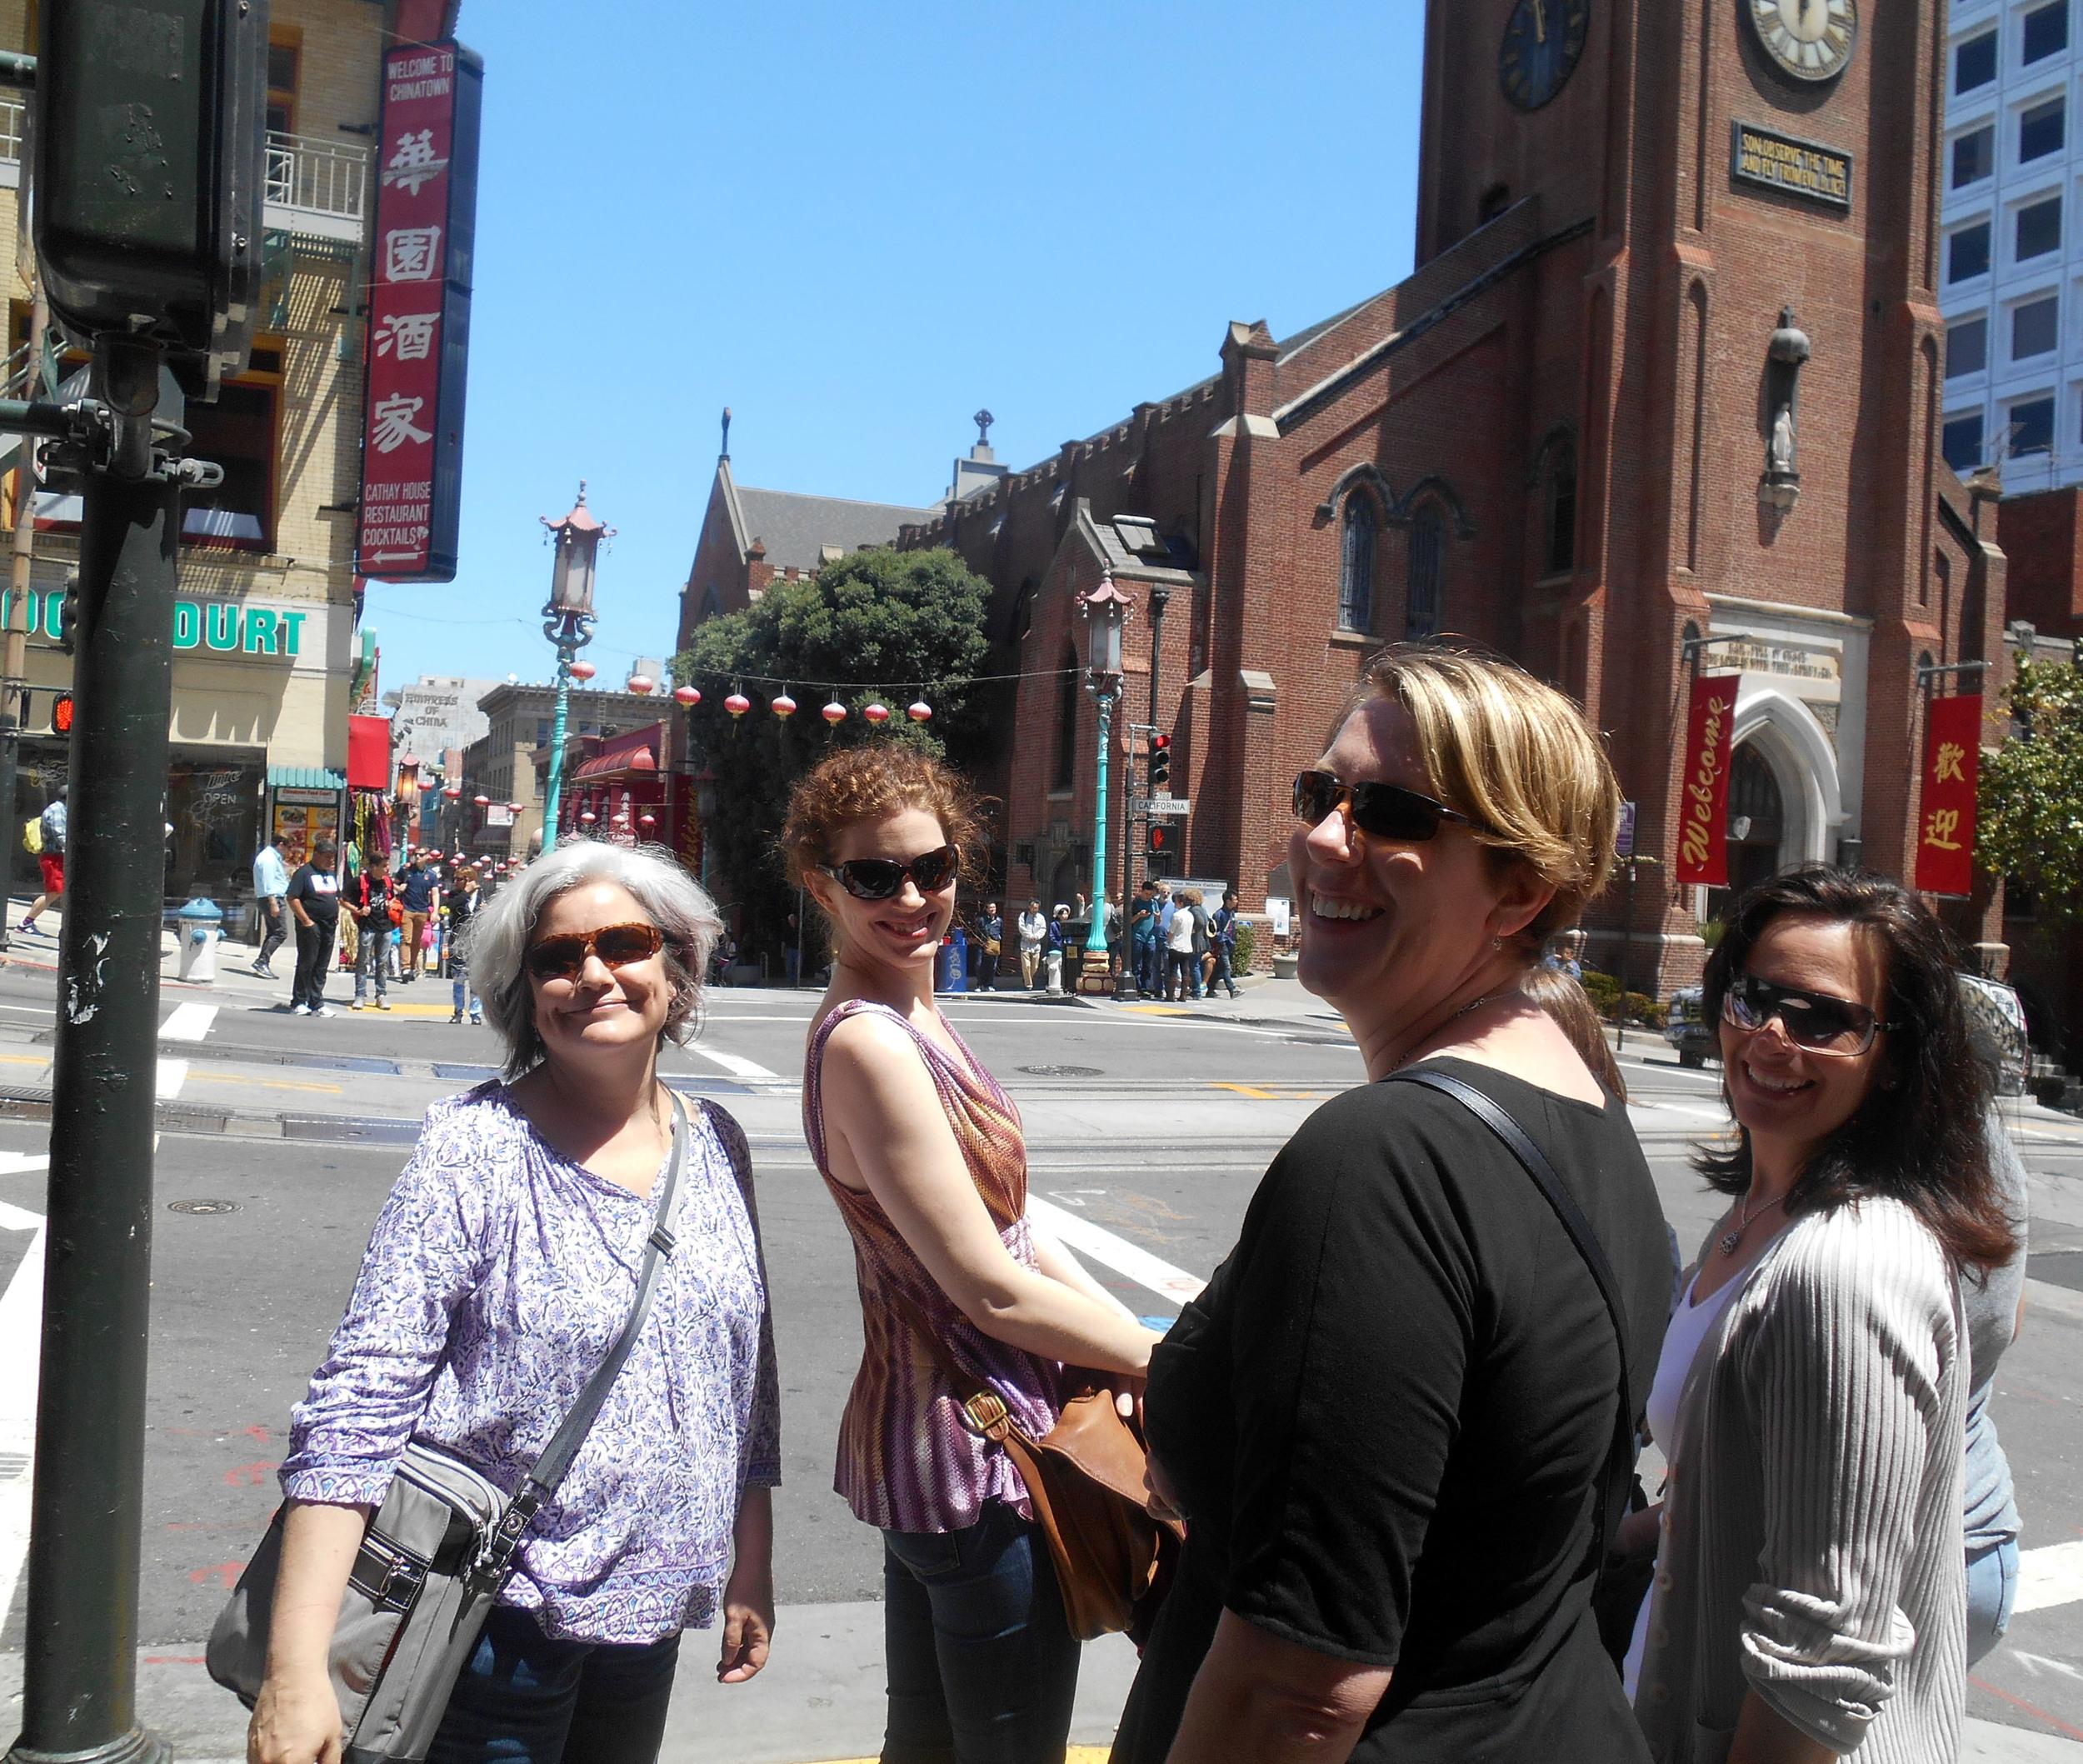 Julie Dillard, Sarah McGuire, Kristen Crowley Held and Amy Allgeyer chilling in Chinatown.